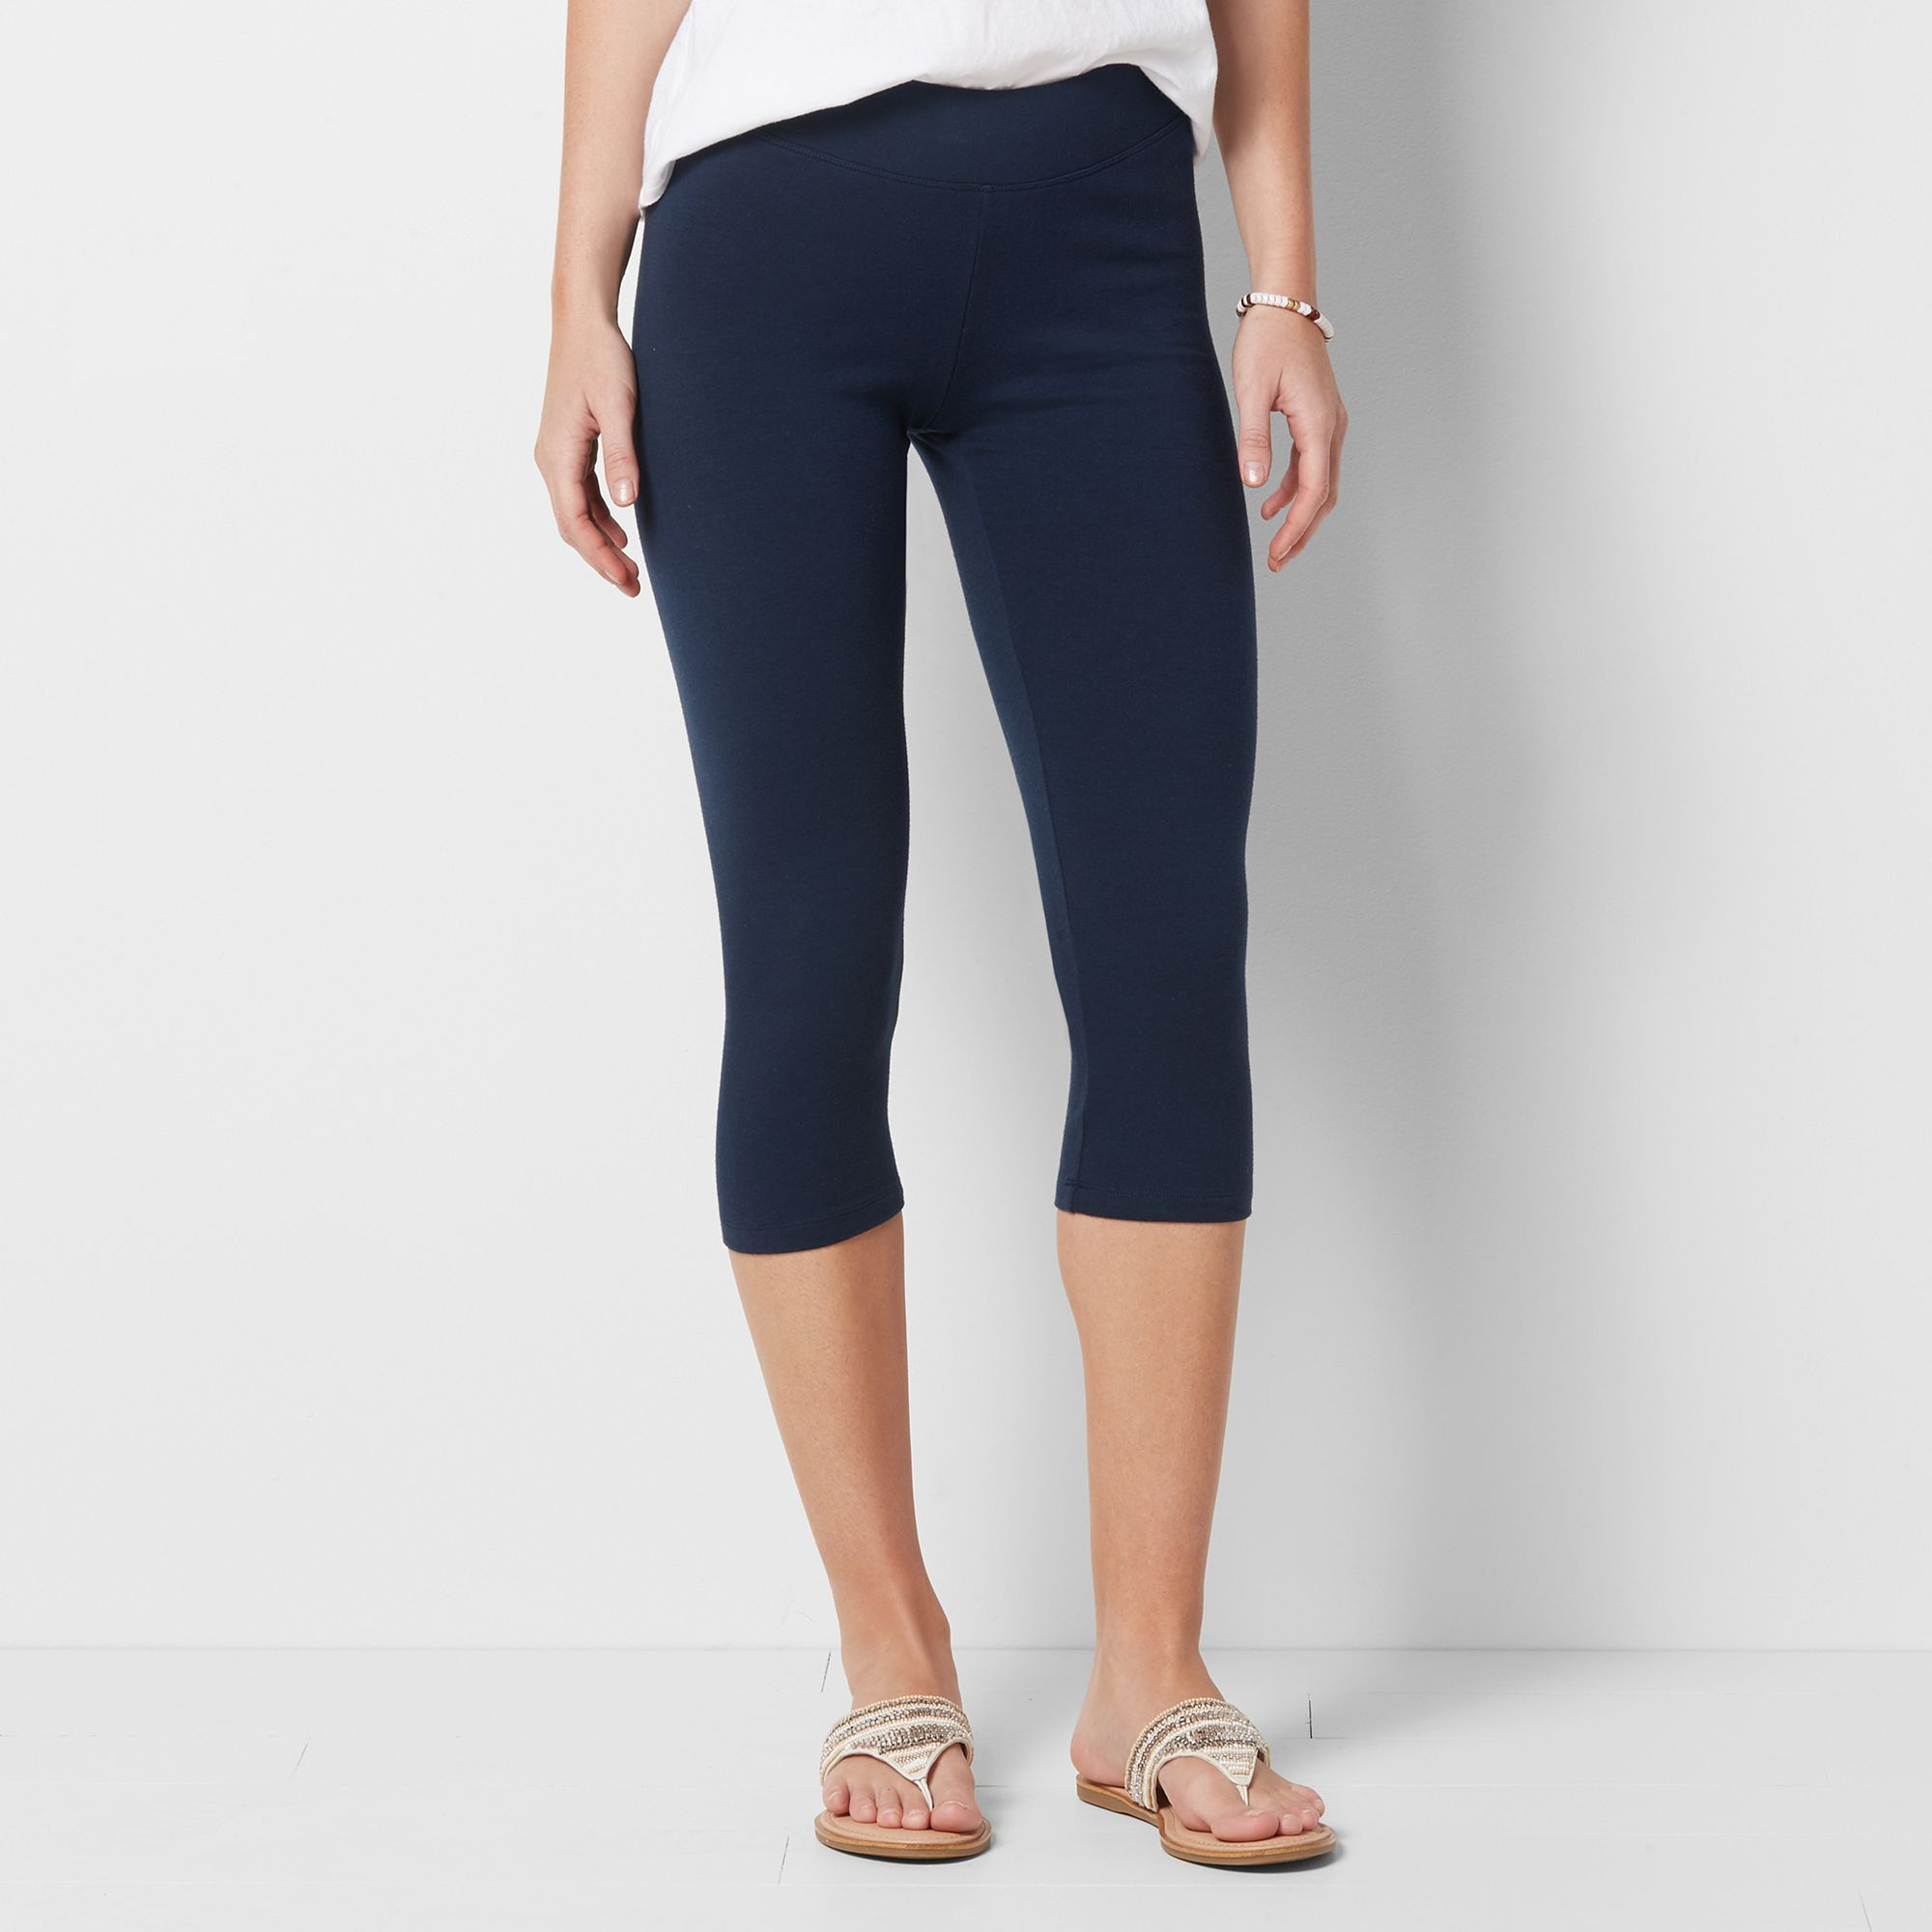 "a0ac6a11fff698 Women's SONOMA Goods for Lifeâ""¢ Wide Waist Capri Leggings, Size: Small,  Dark Blue"